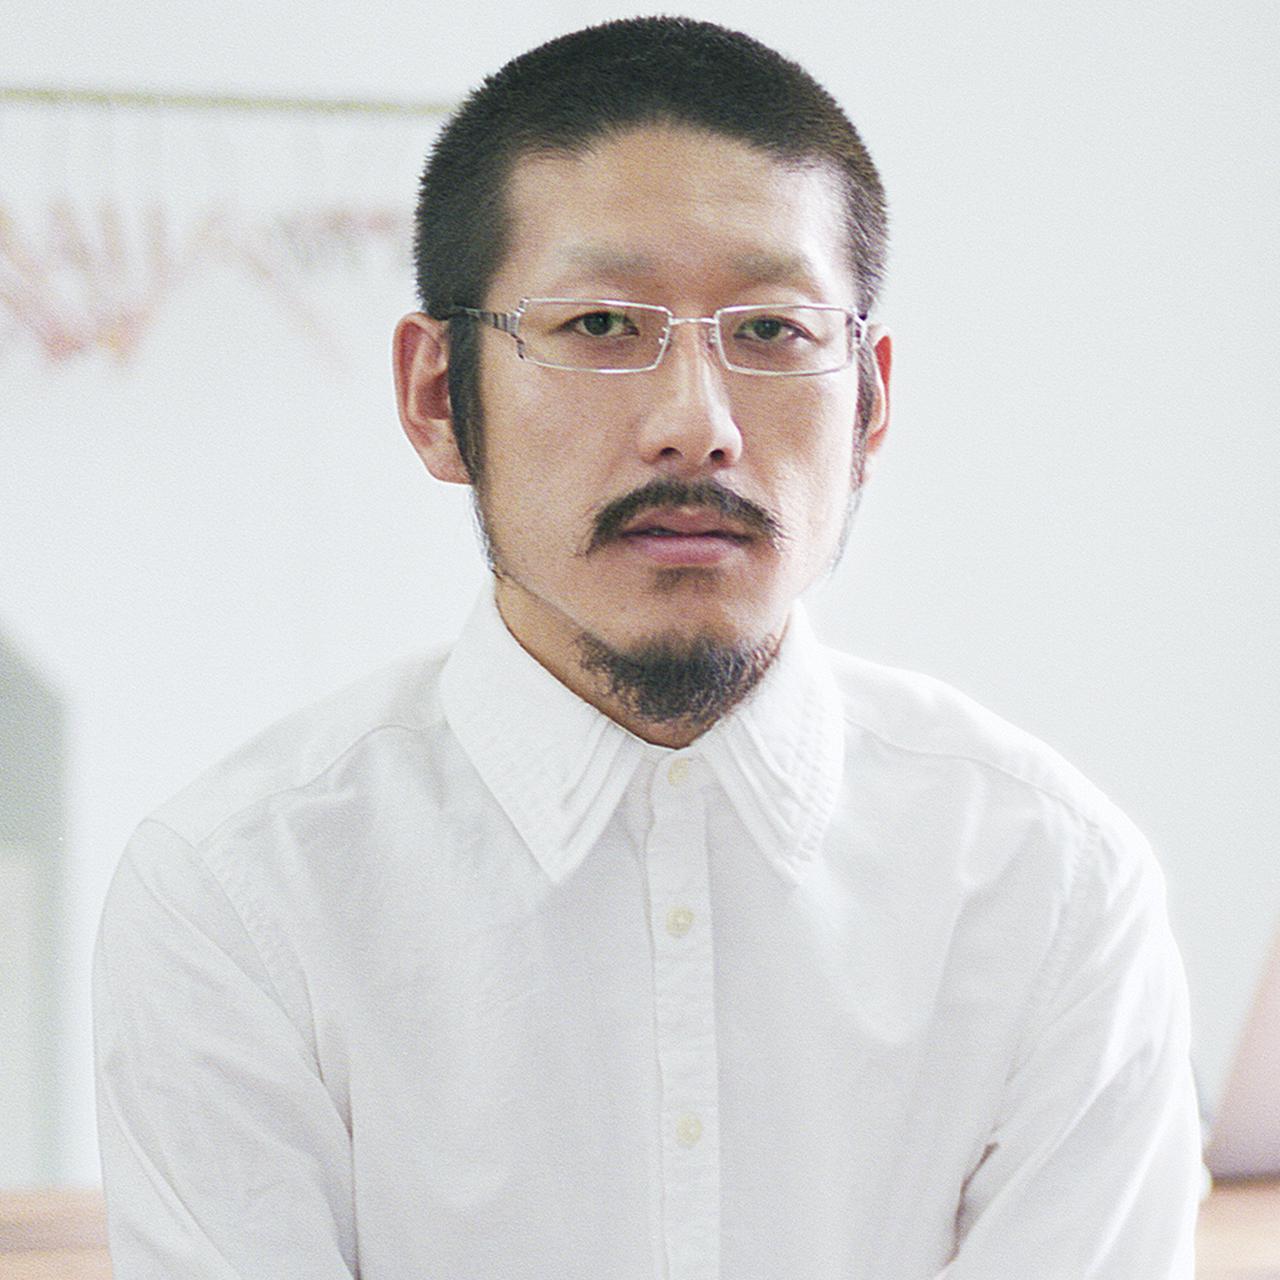 Images : 森永邦彦(KUNIHIKO MORINAGA)さん